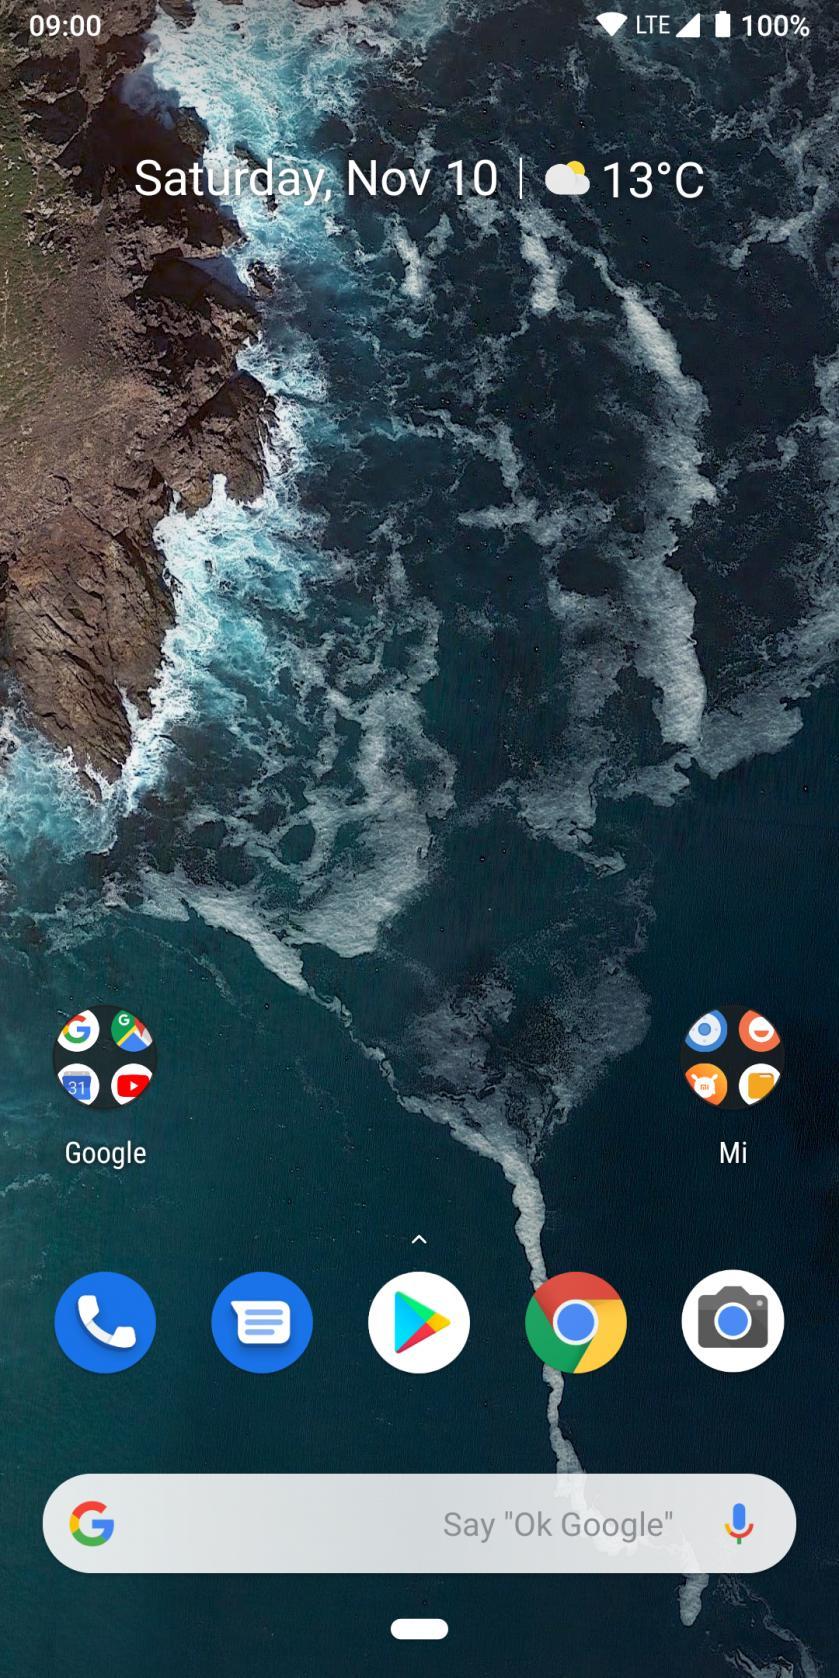 Download Xiaomi Mi A2 Android 9 0 Pie Beta Update